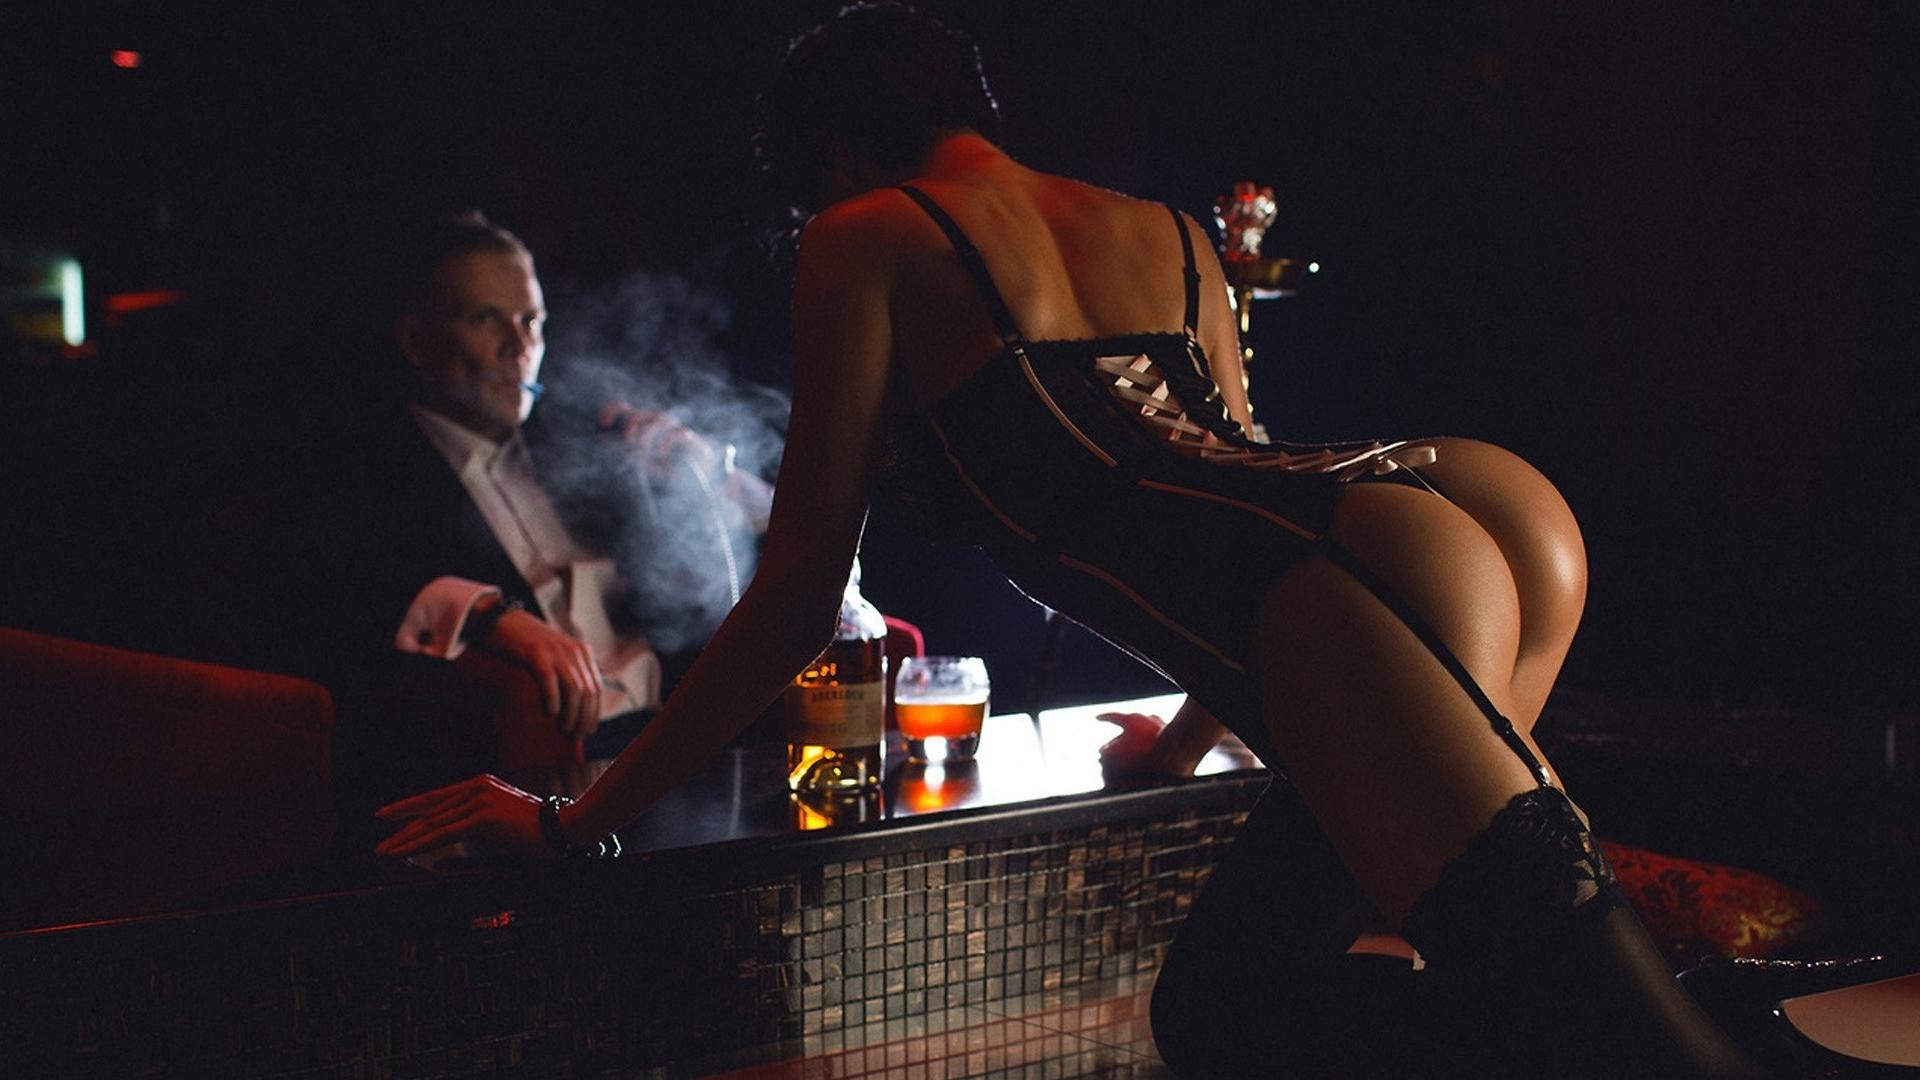 seksualnaya-devchonka-tantsuet-striptiz